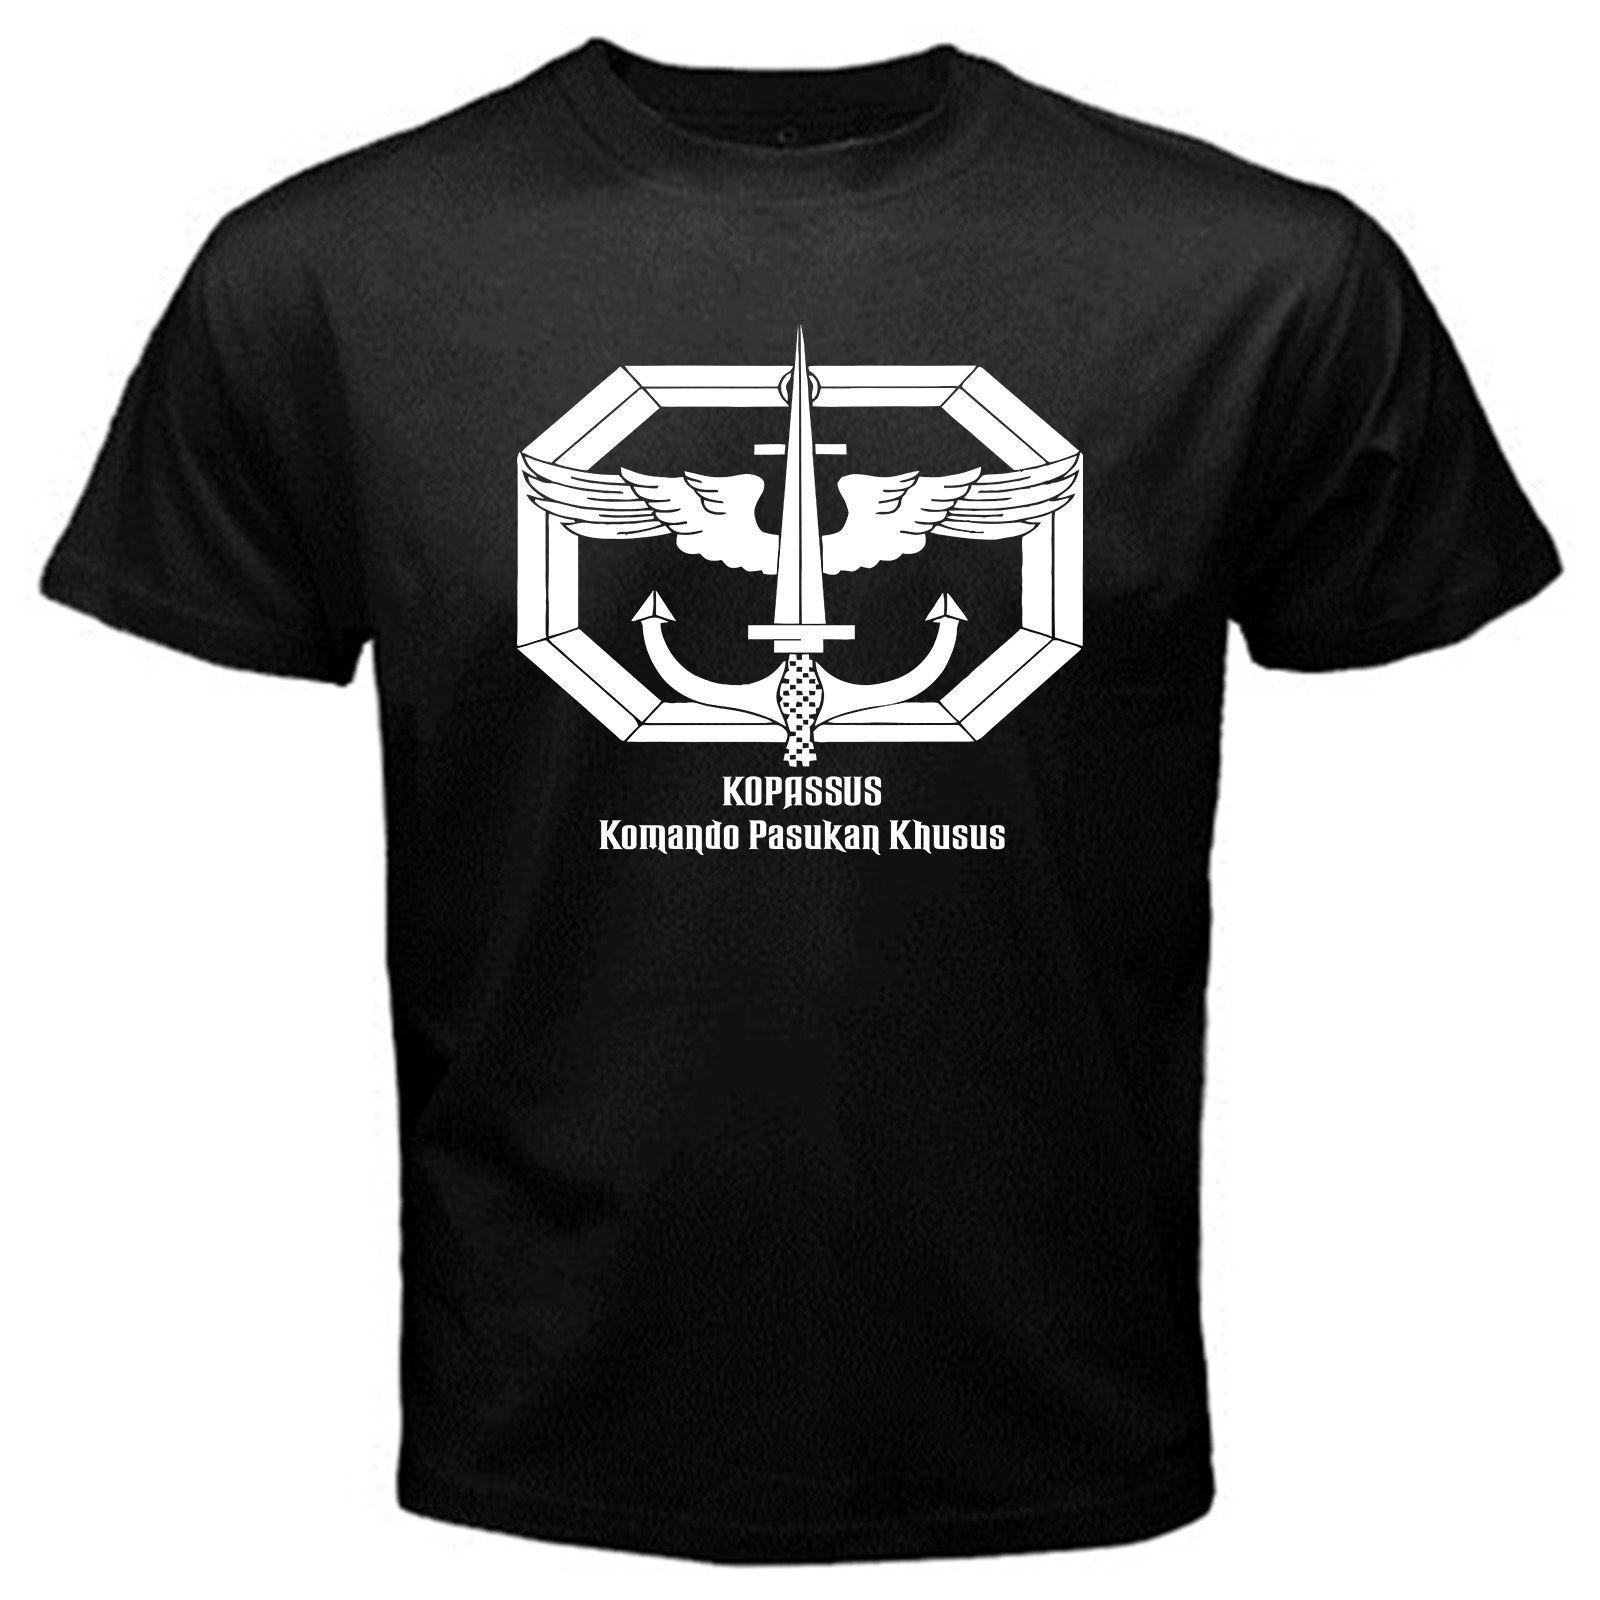 Kopassus Indonesien besondere Kraft Boden Kommando T-Shirt Basic Tee